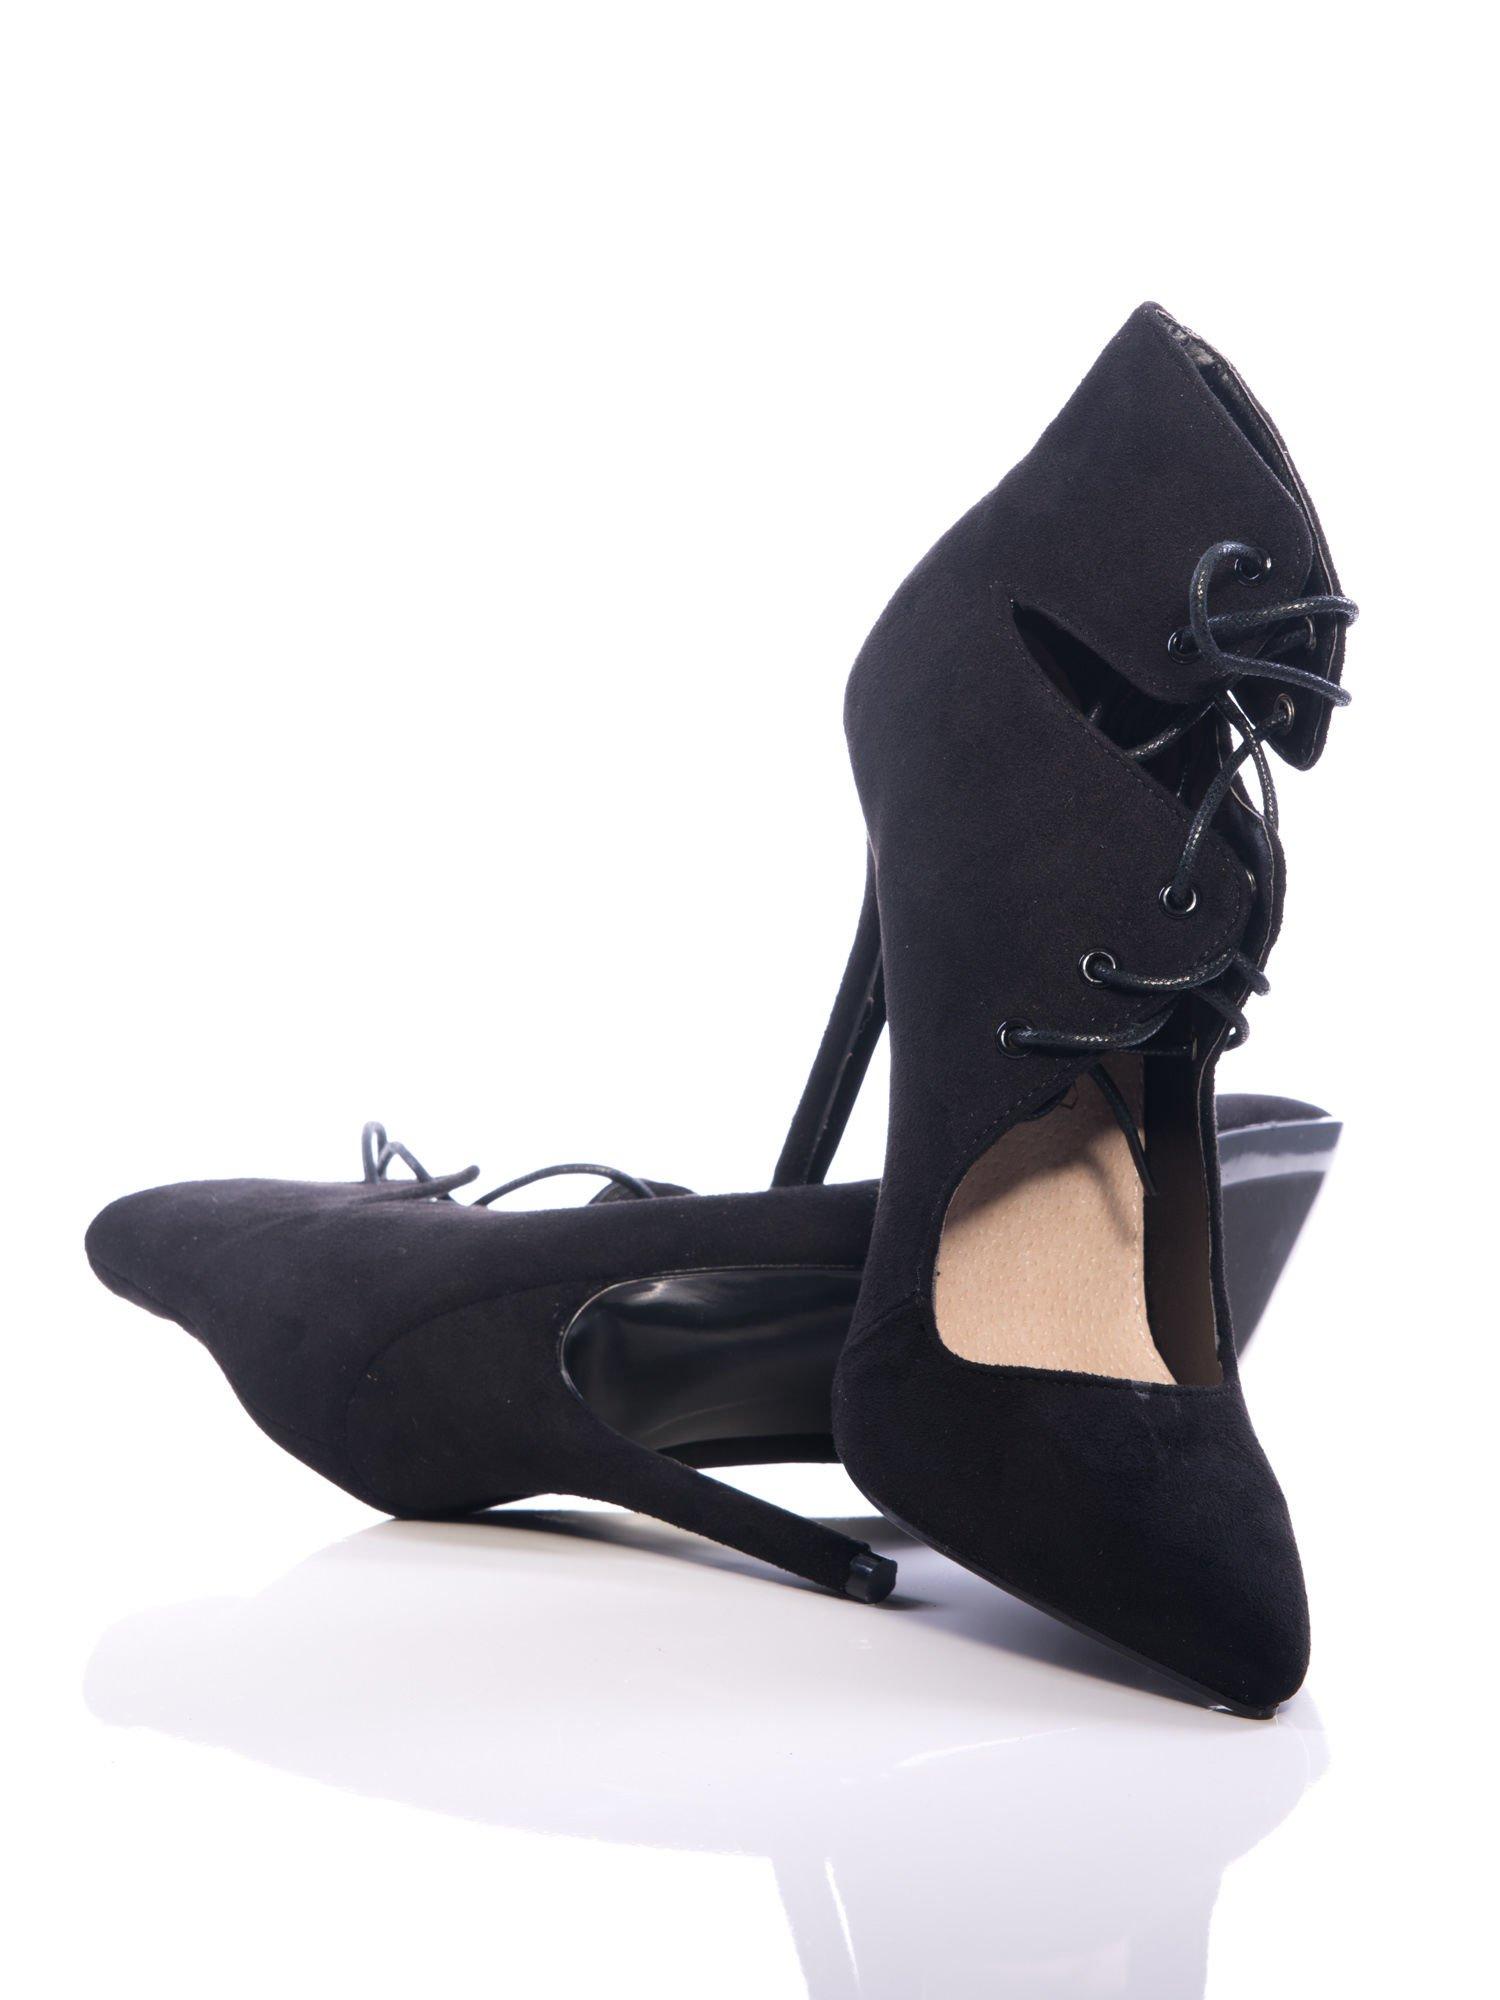 Czarne zamszowe sznurowane botki faux suede Isolde cut out lace up                                  zdj.                                  2